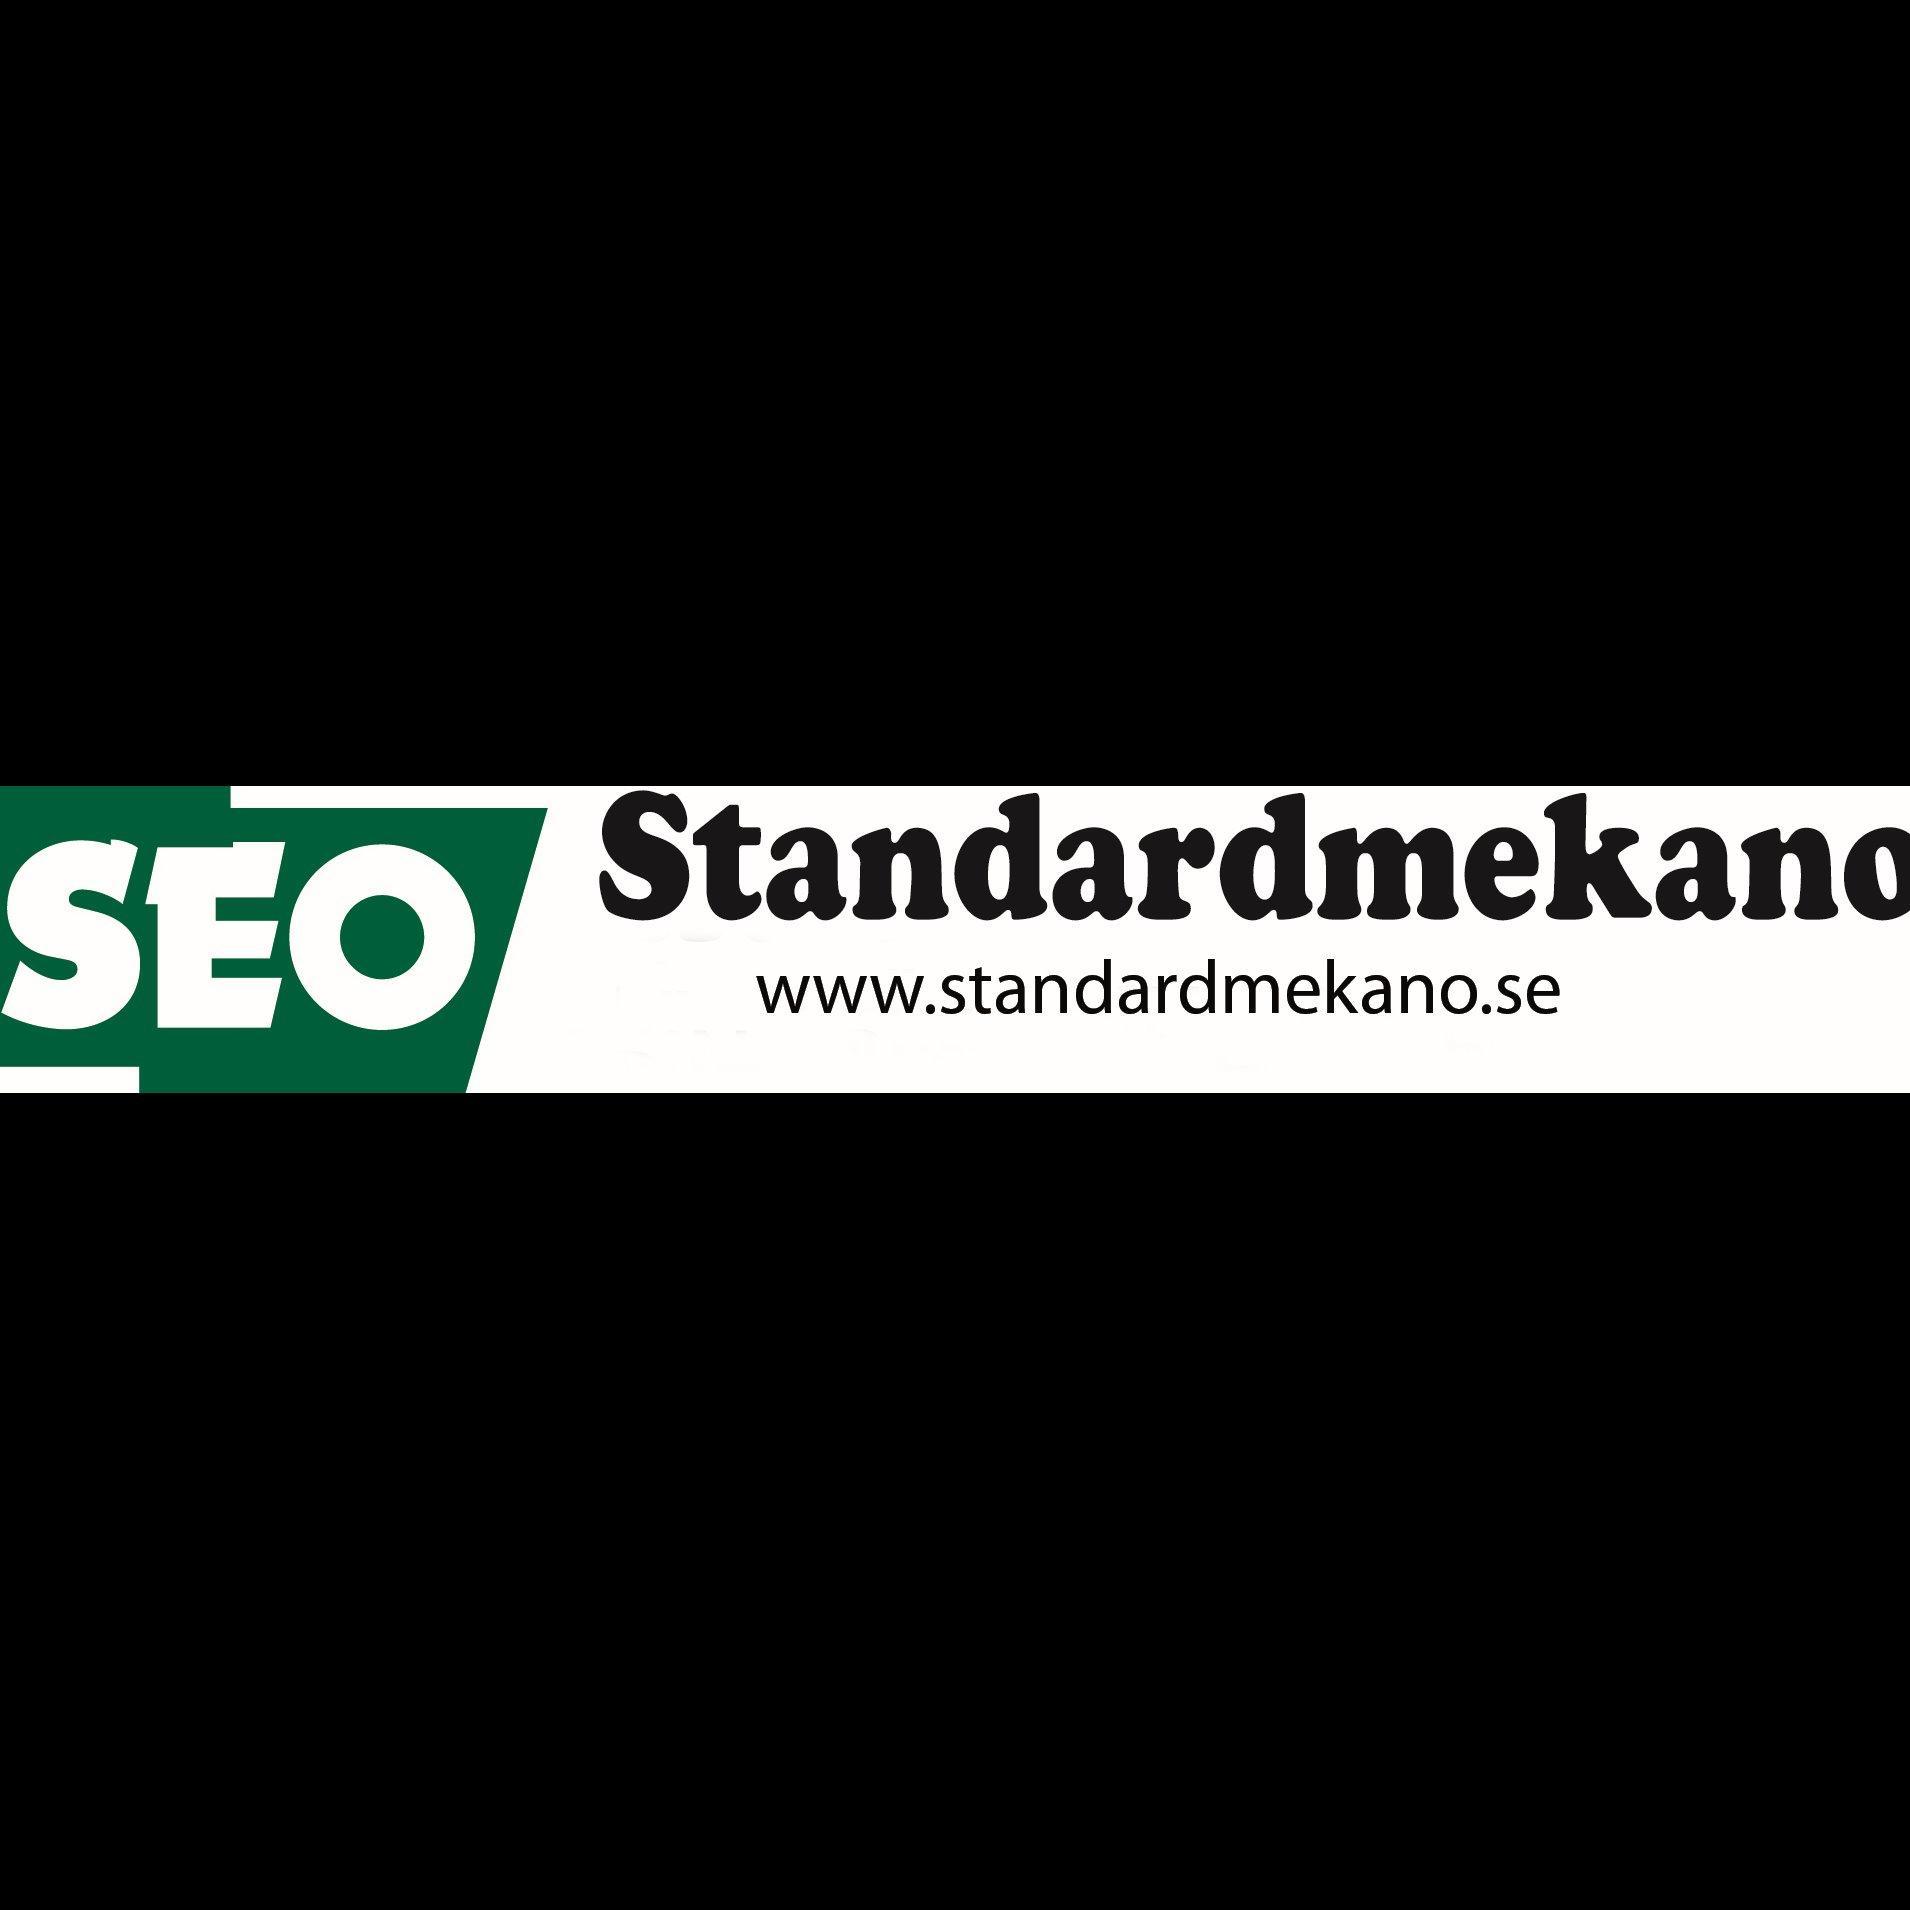 Standardmekano Försäljnings AB